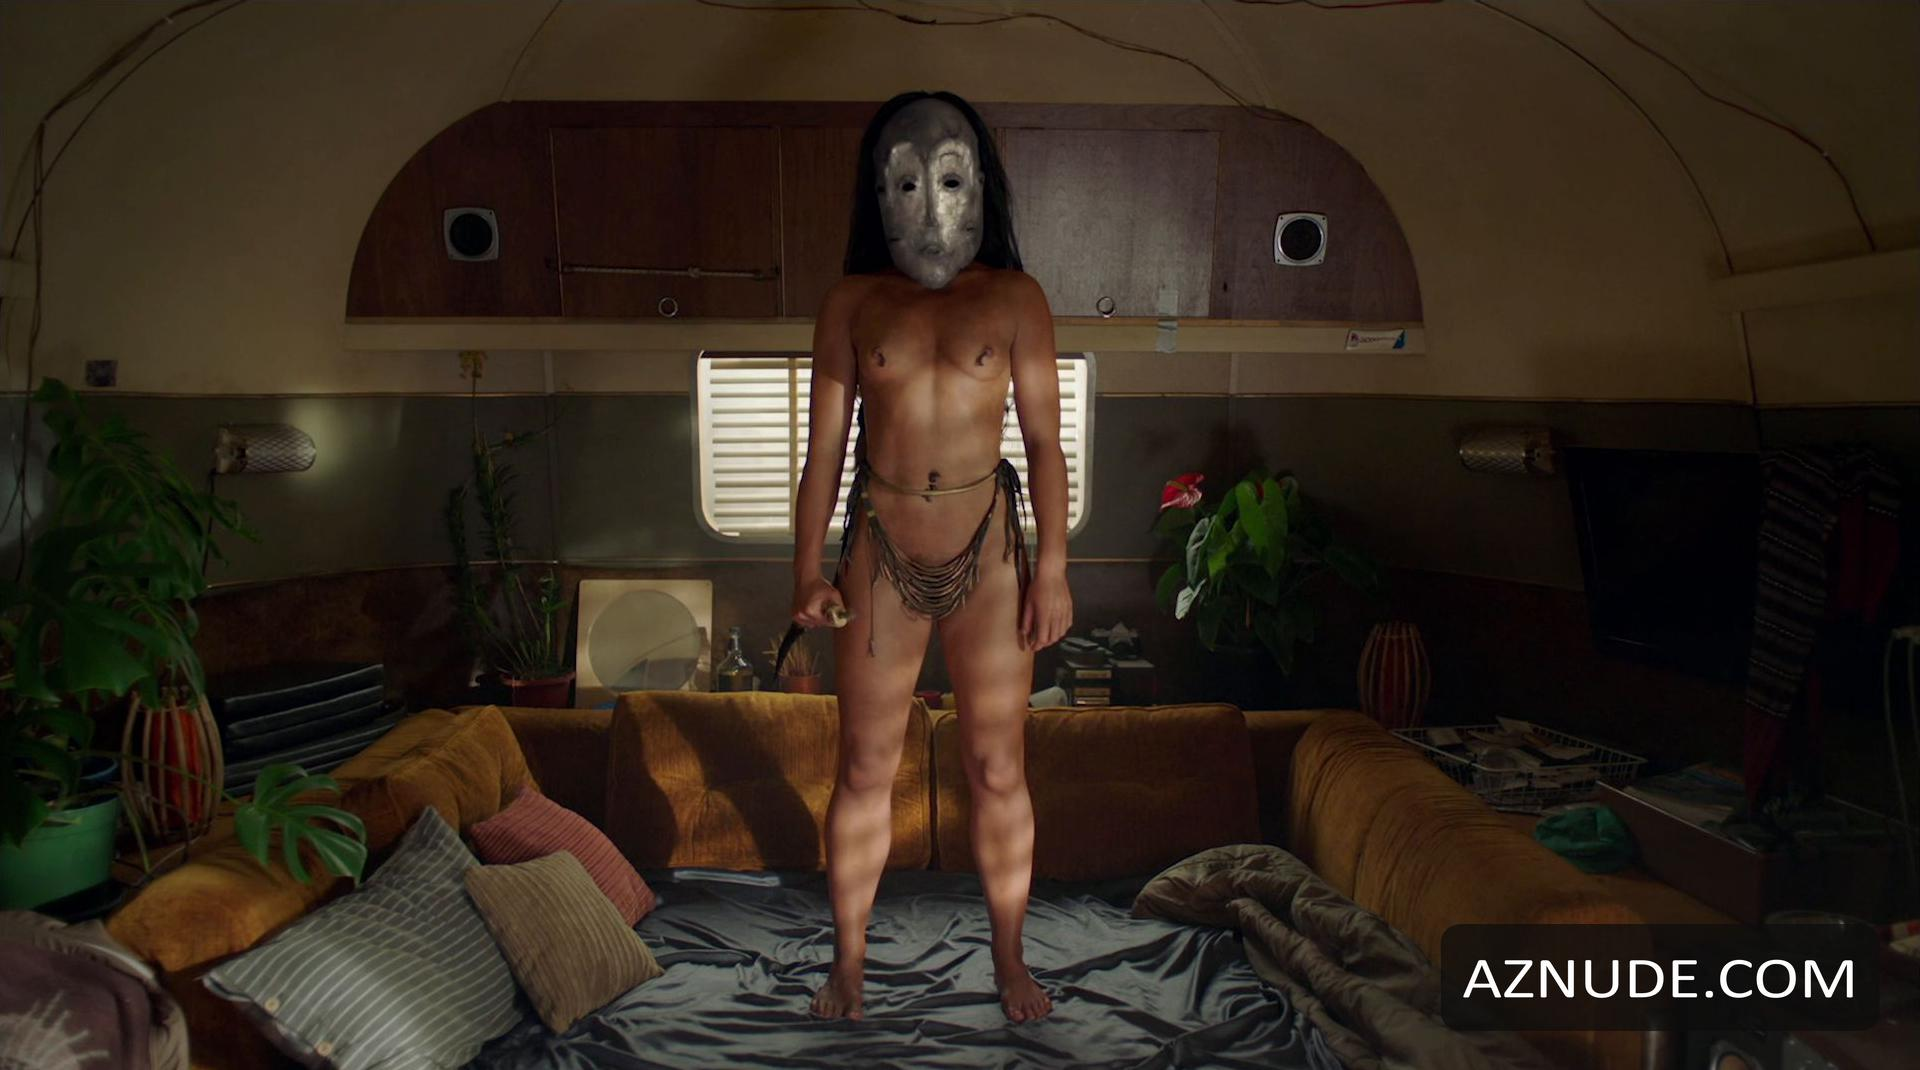 Knock knock 2015 sex scene ana de armas lorenza izzo - 2 part 9